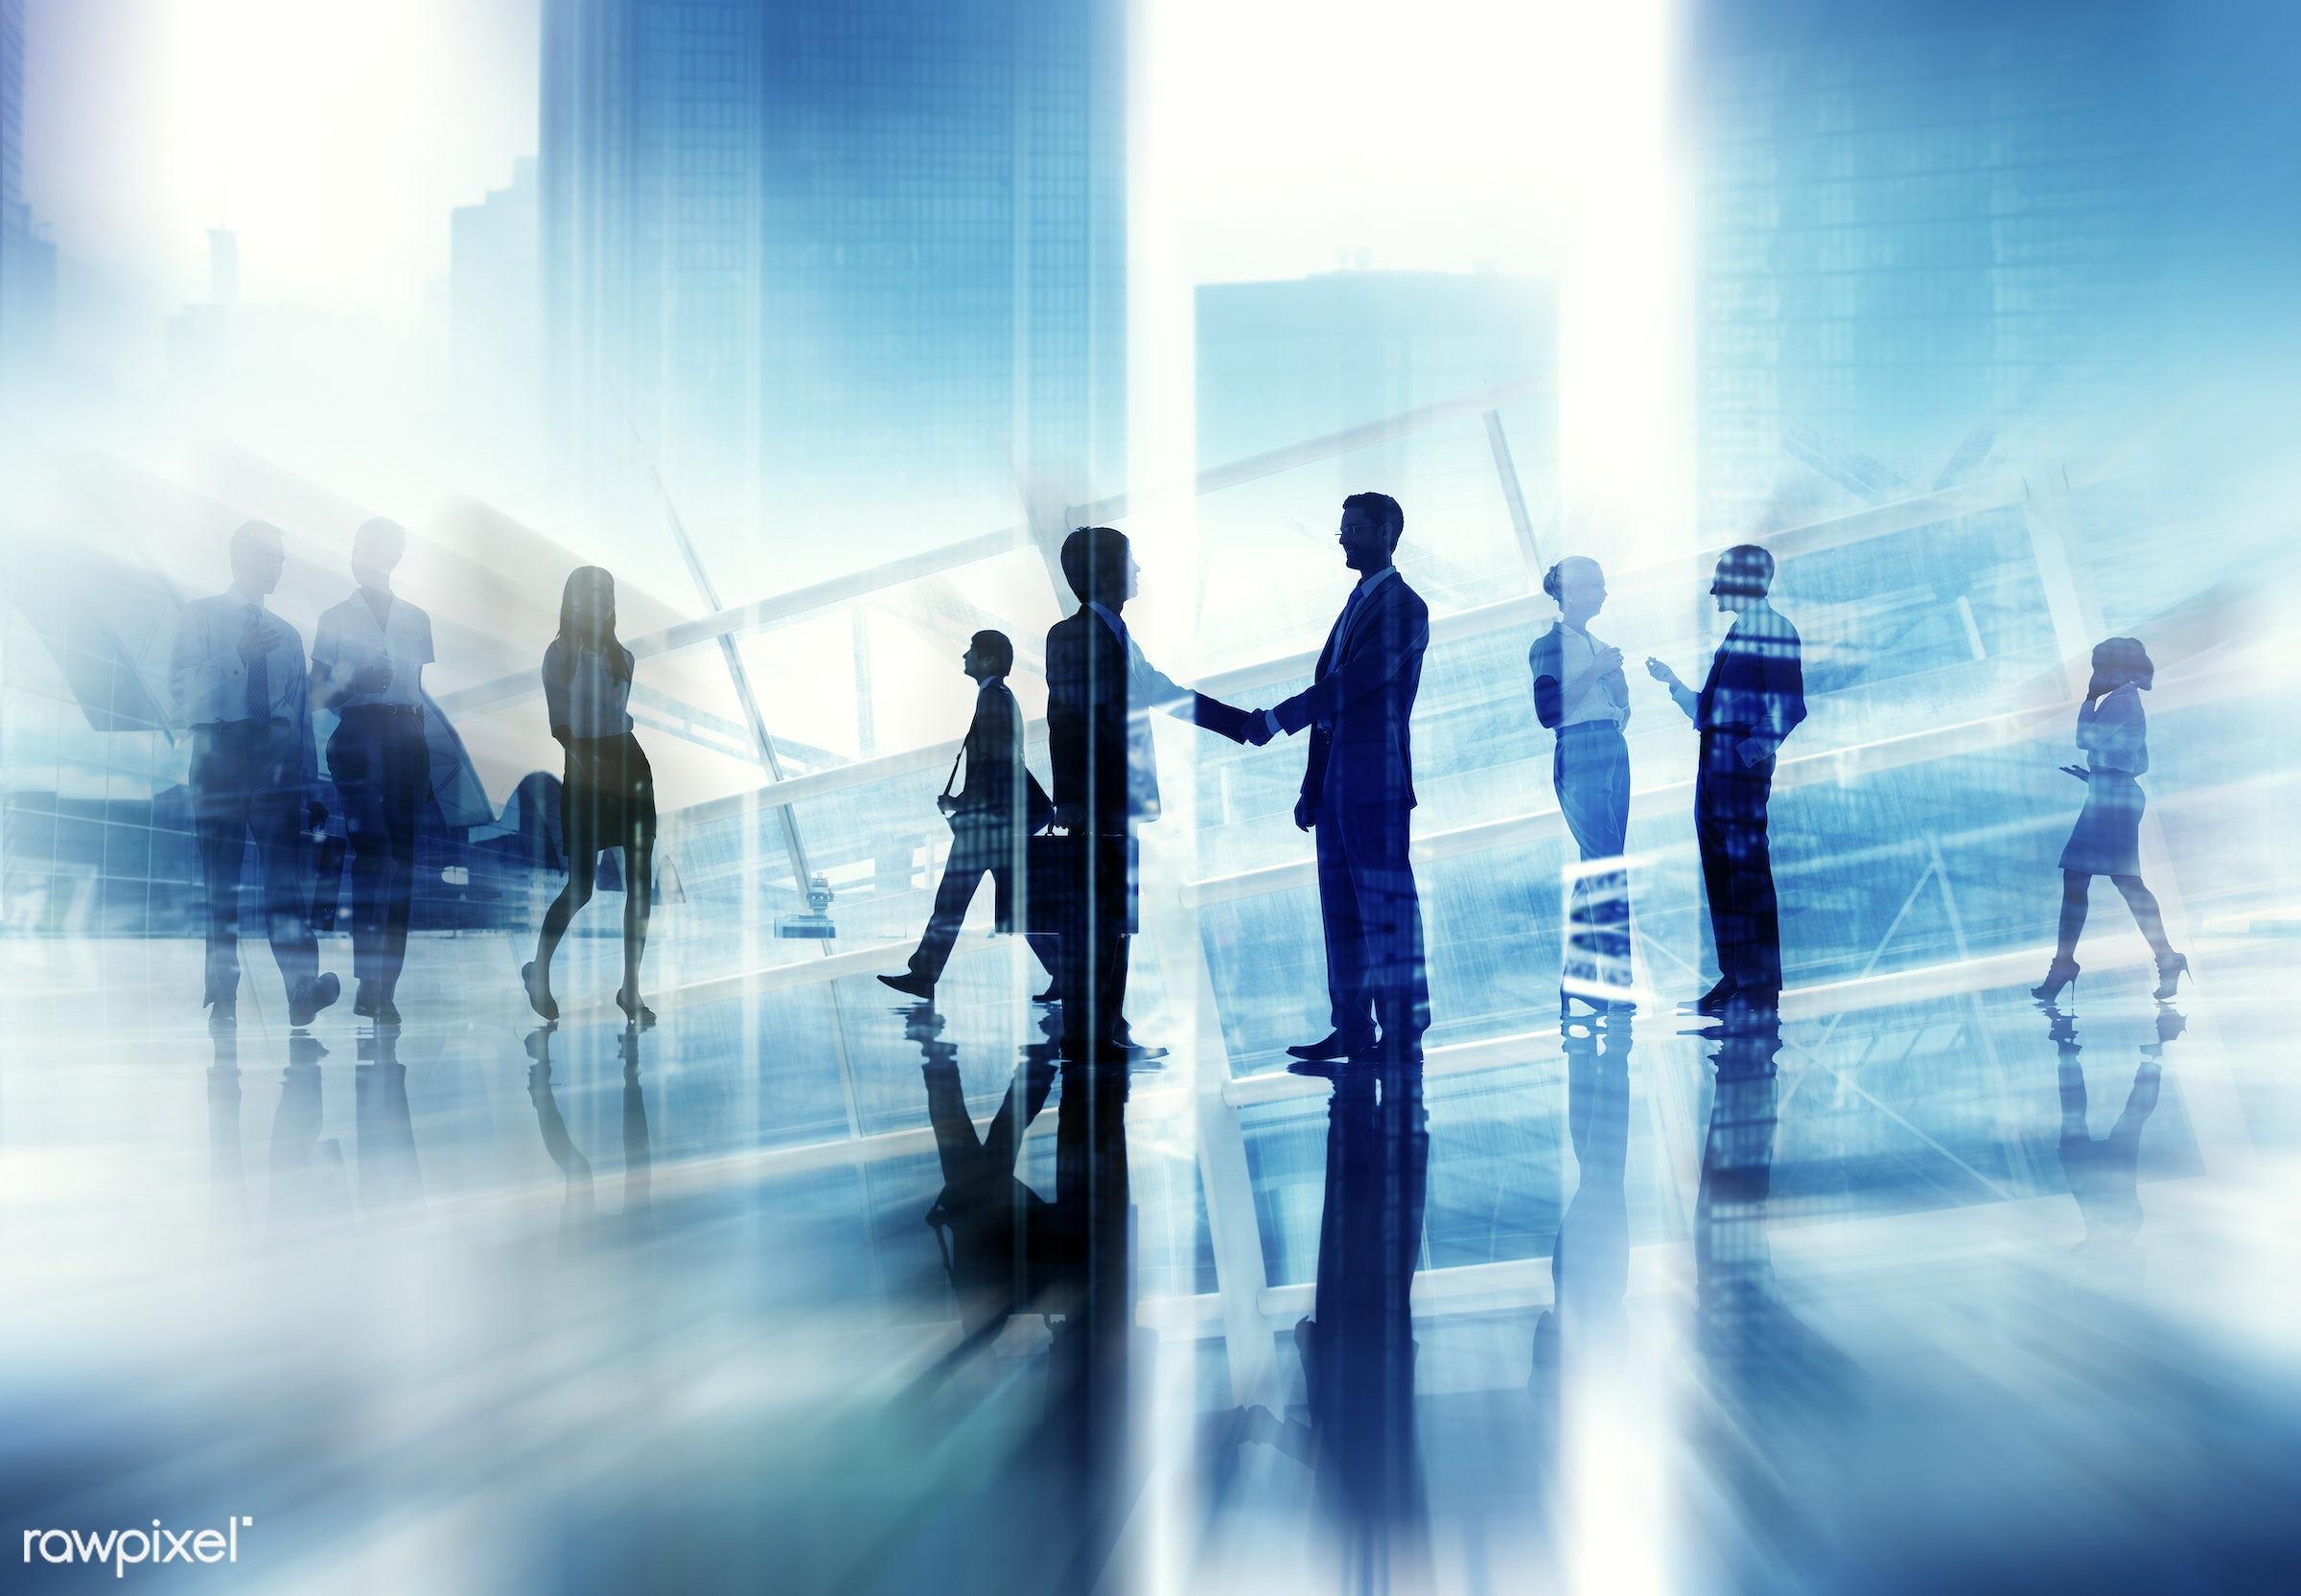 brainstorming, building, business, business people, businessmen, businesswomen, city, cityscape, collaboration, colleague,...